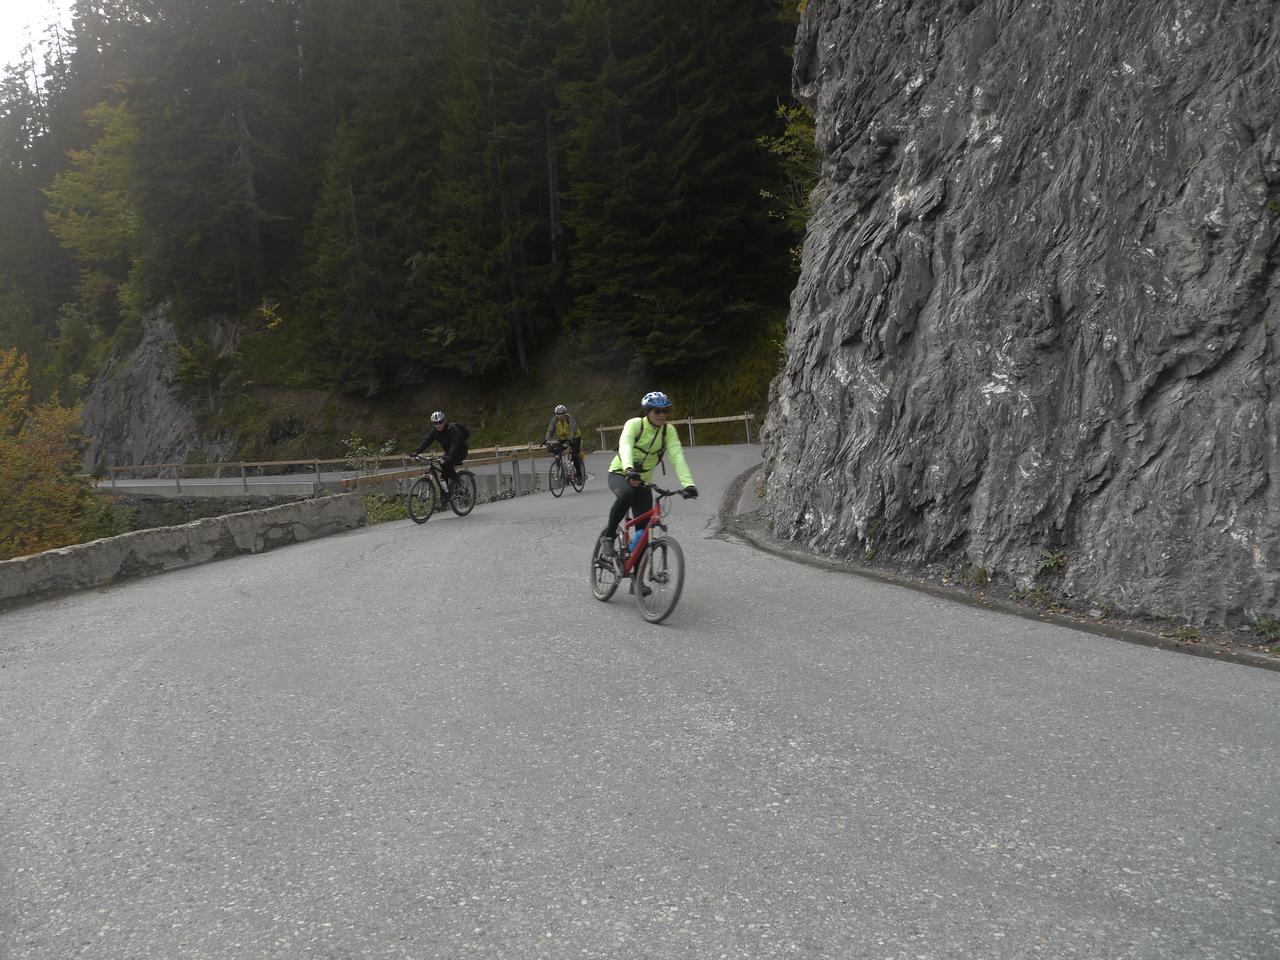 @RobAng 2013 / Neukirch, Safien Platz, Kanton Graubünden, CHE, Schweiz, 1275 m ü/M, 2013/10/03 15:39:20